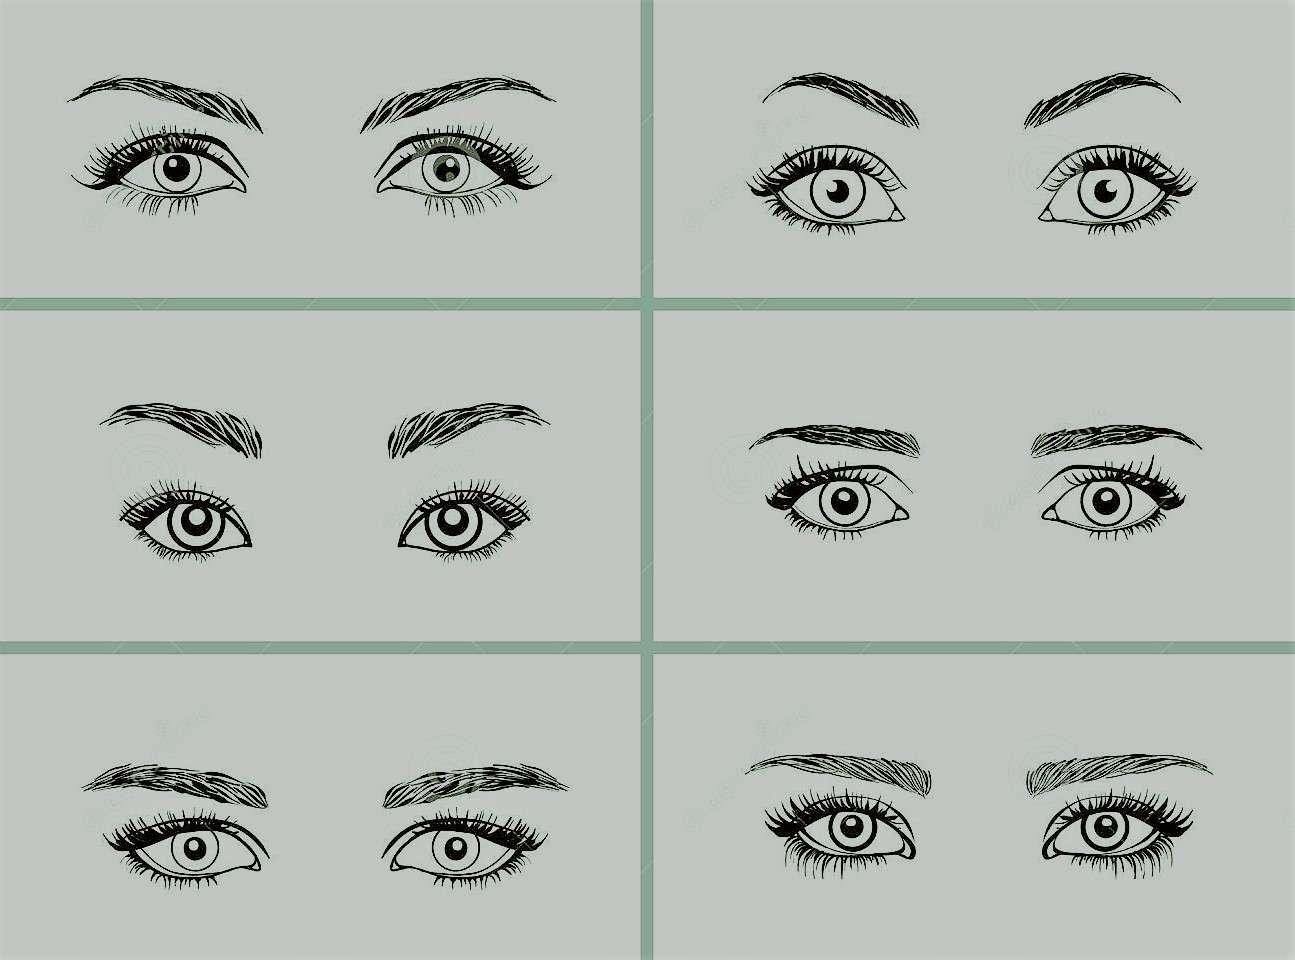 shapes_of_eye.jpg